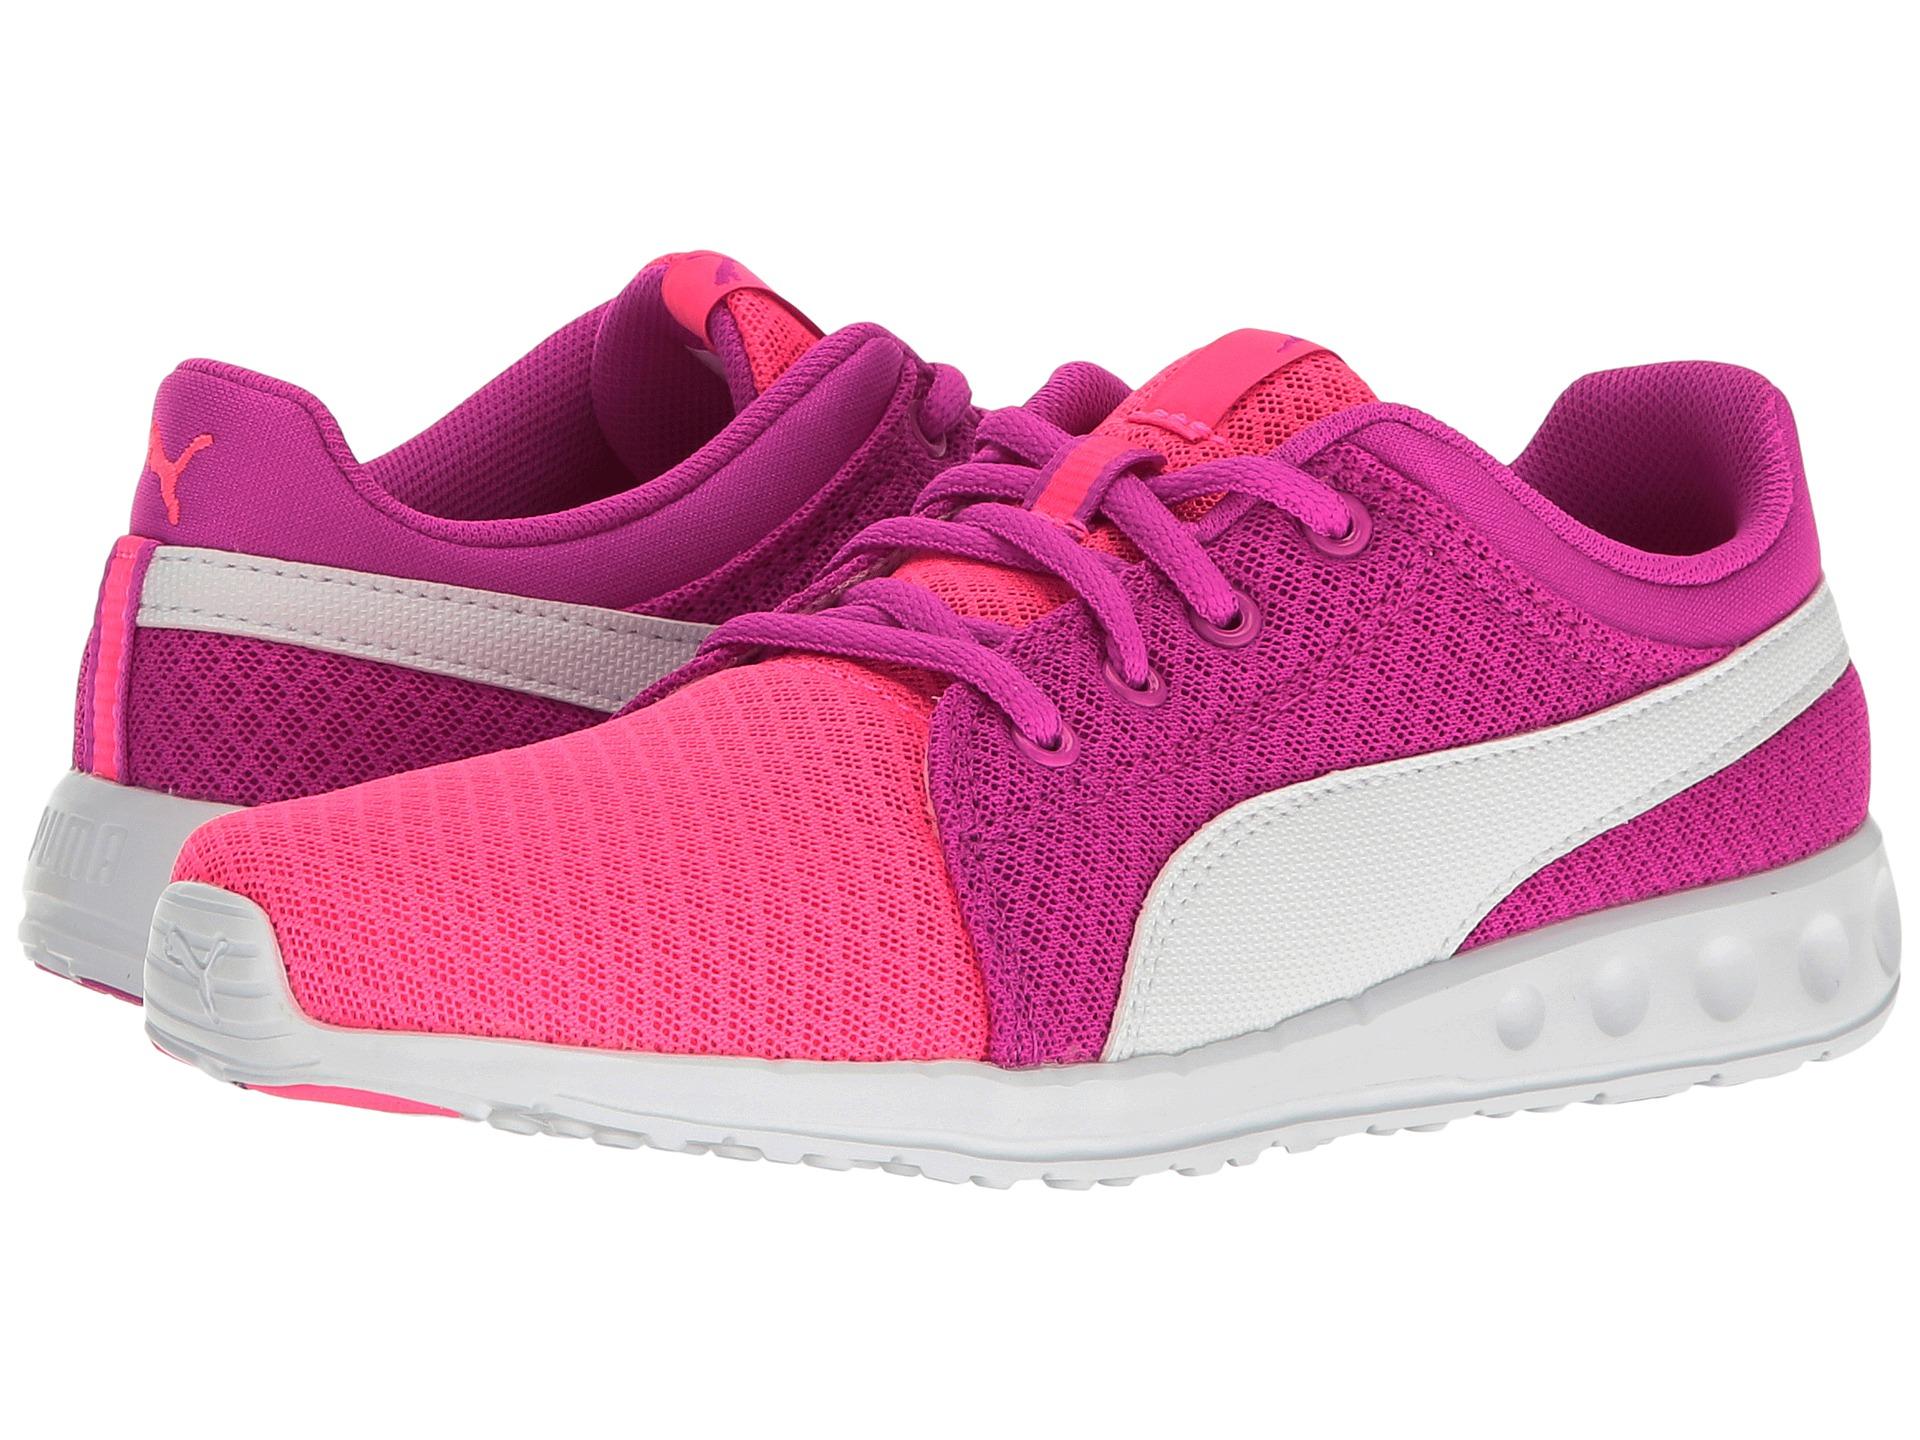 e23a9aaf230f Buy puma carson runner kids shoes